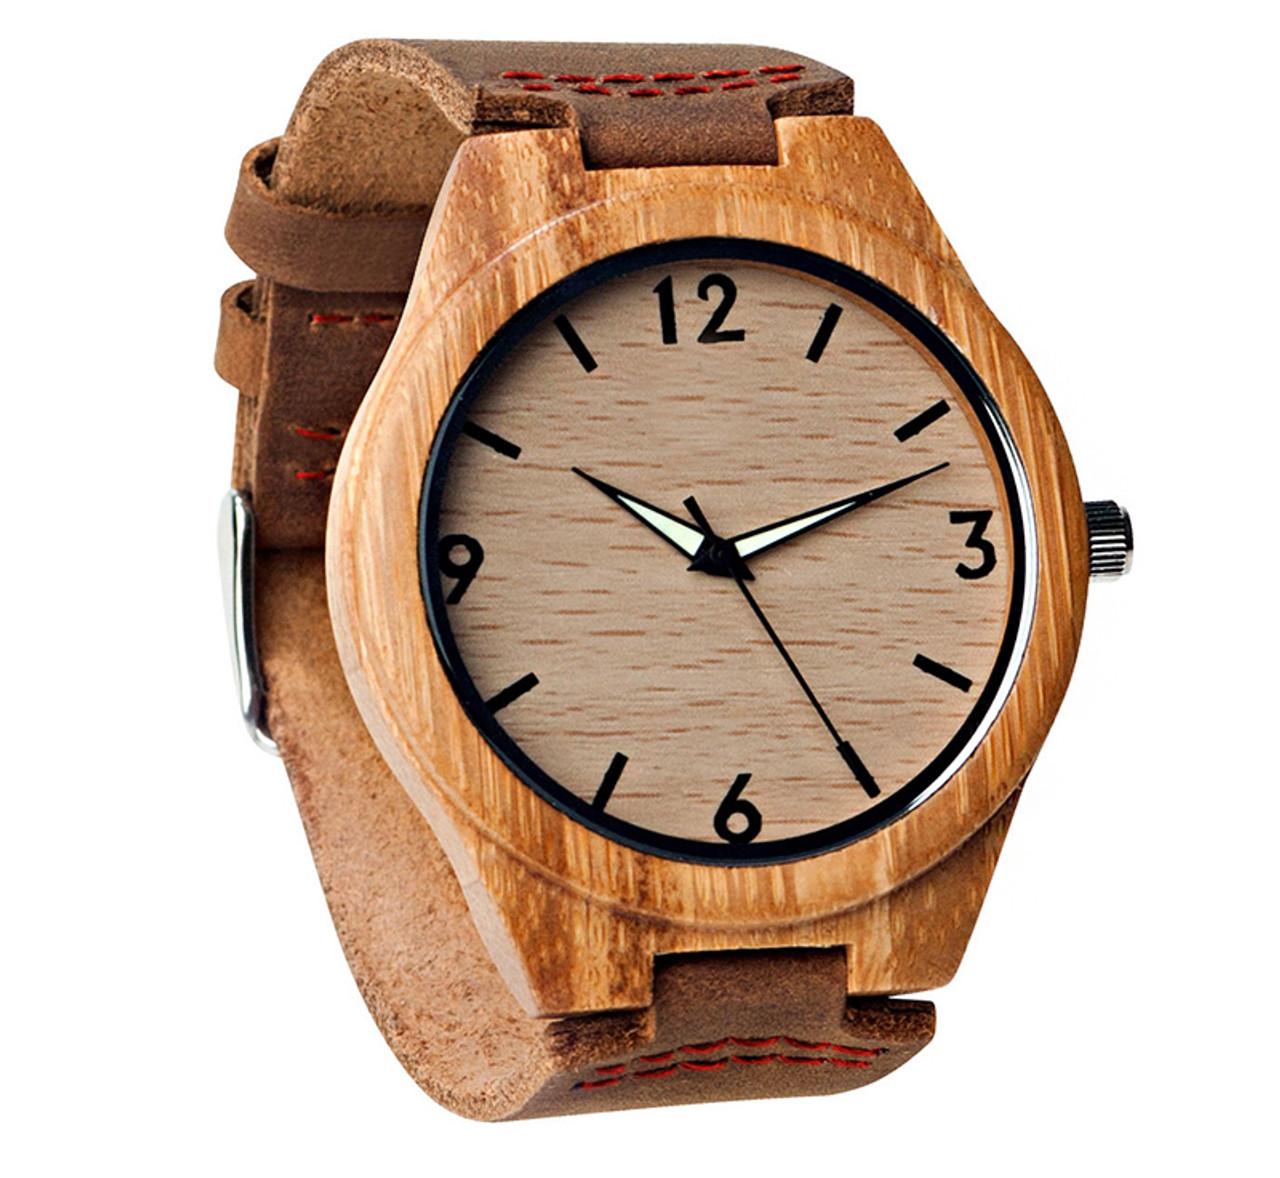 Grpn BE - Wood Engraved Watch Glow Dials W#68 - Aura